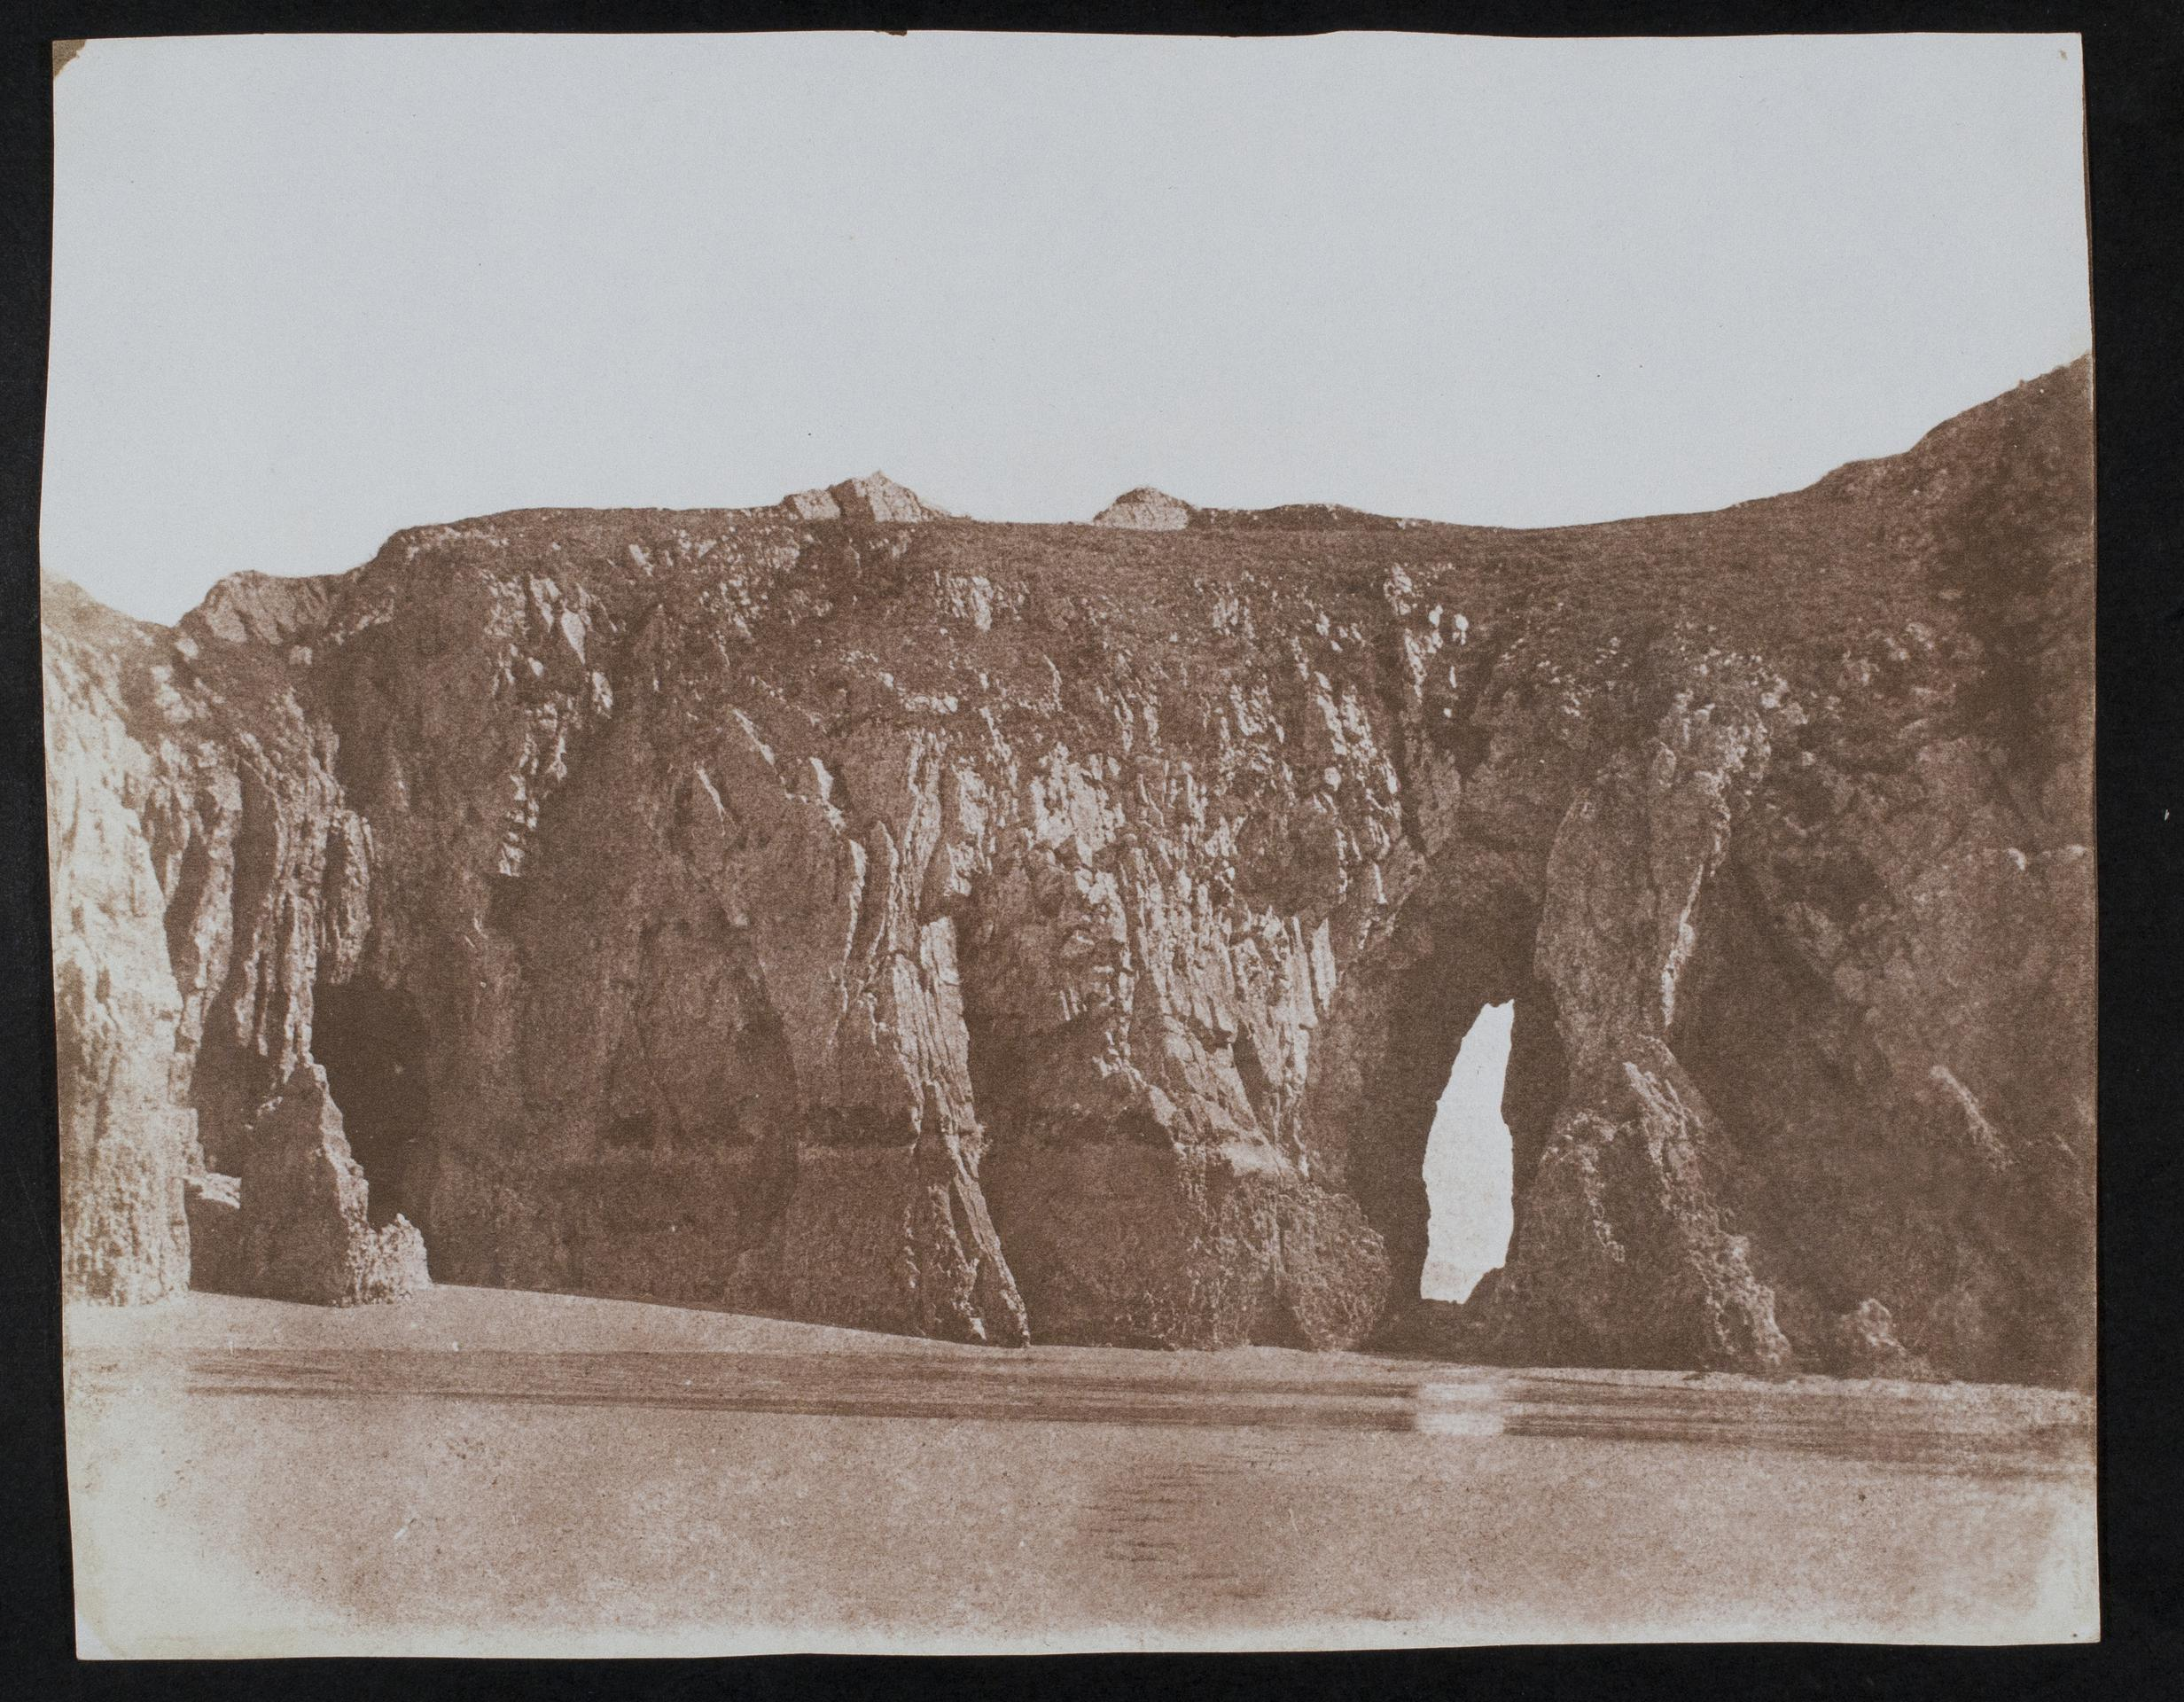 Rock arch in cliff (Three Cliffs Bay?), photograph